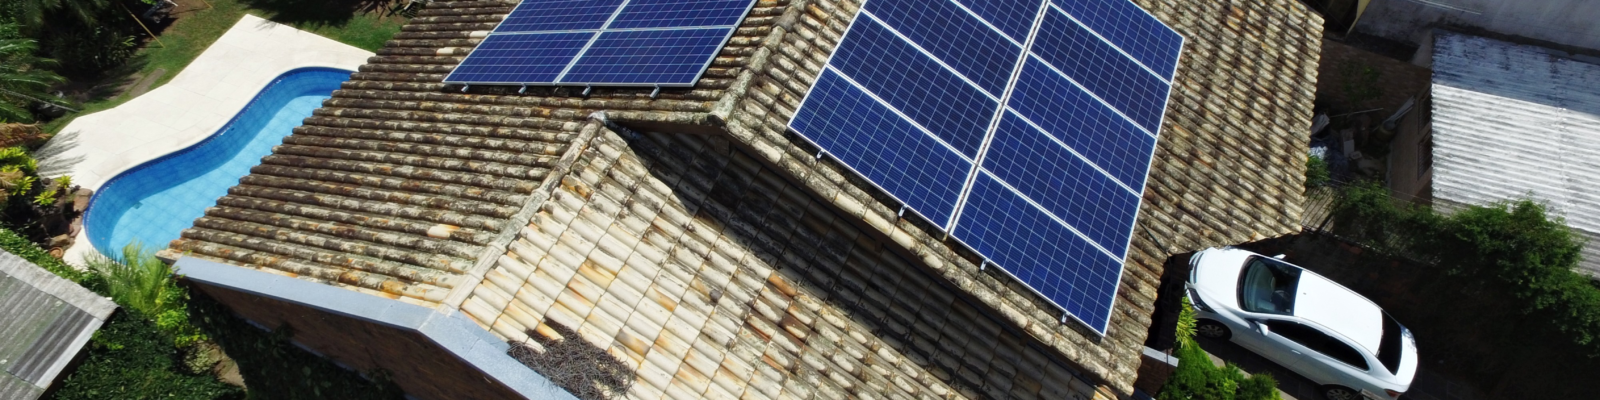 Energia solar residencial em Porto Alegre - Elysia sistema fotovoltaico RS